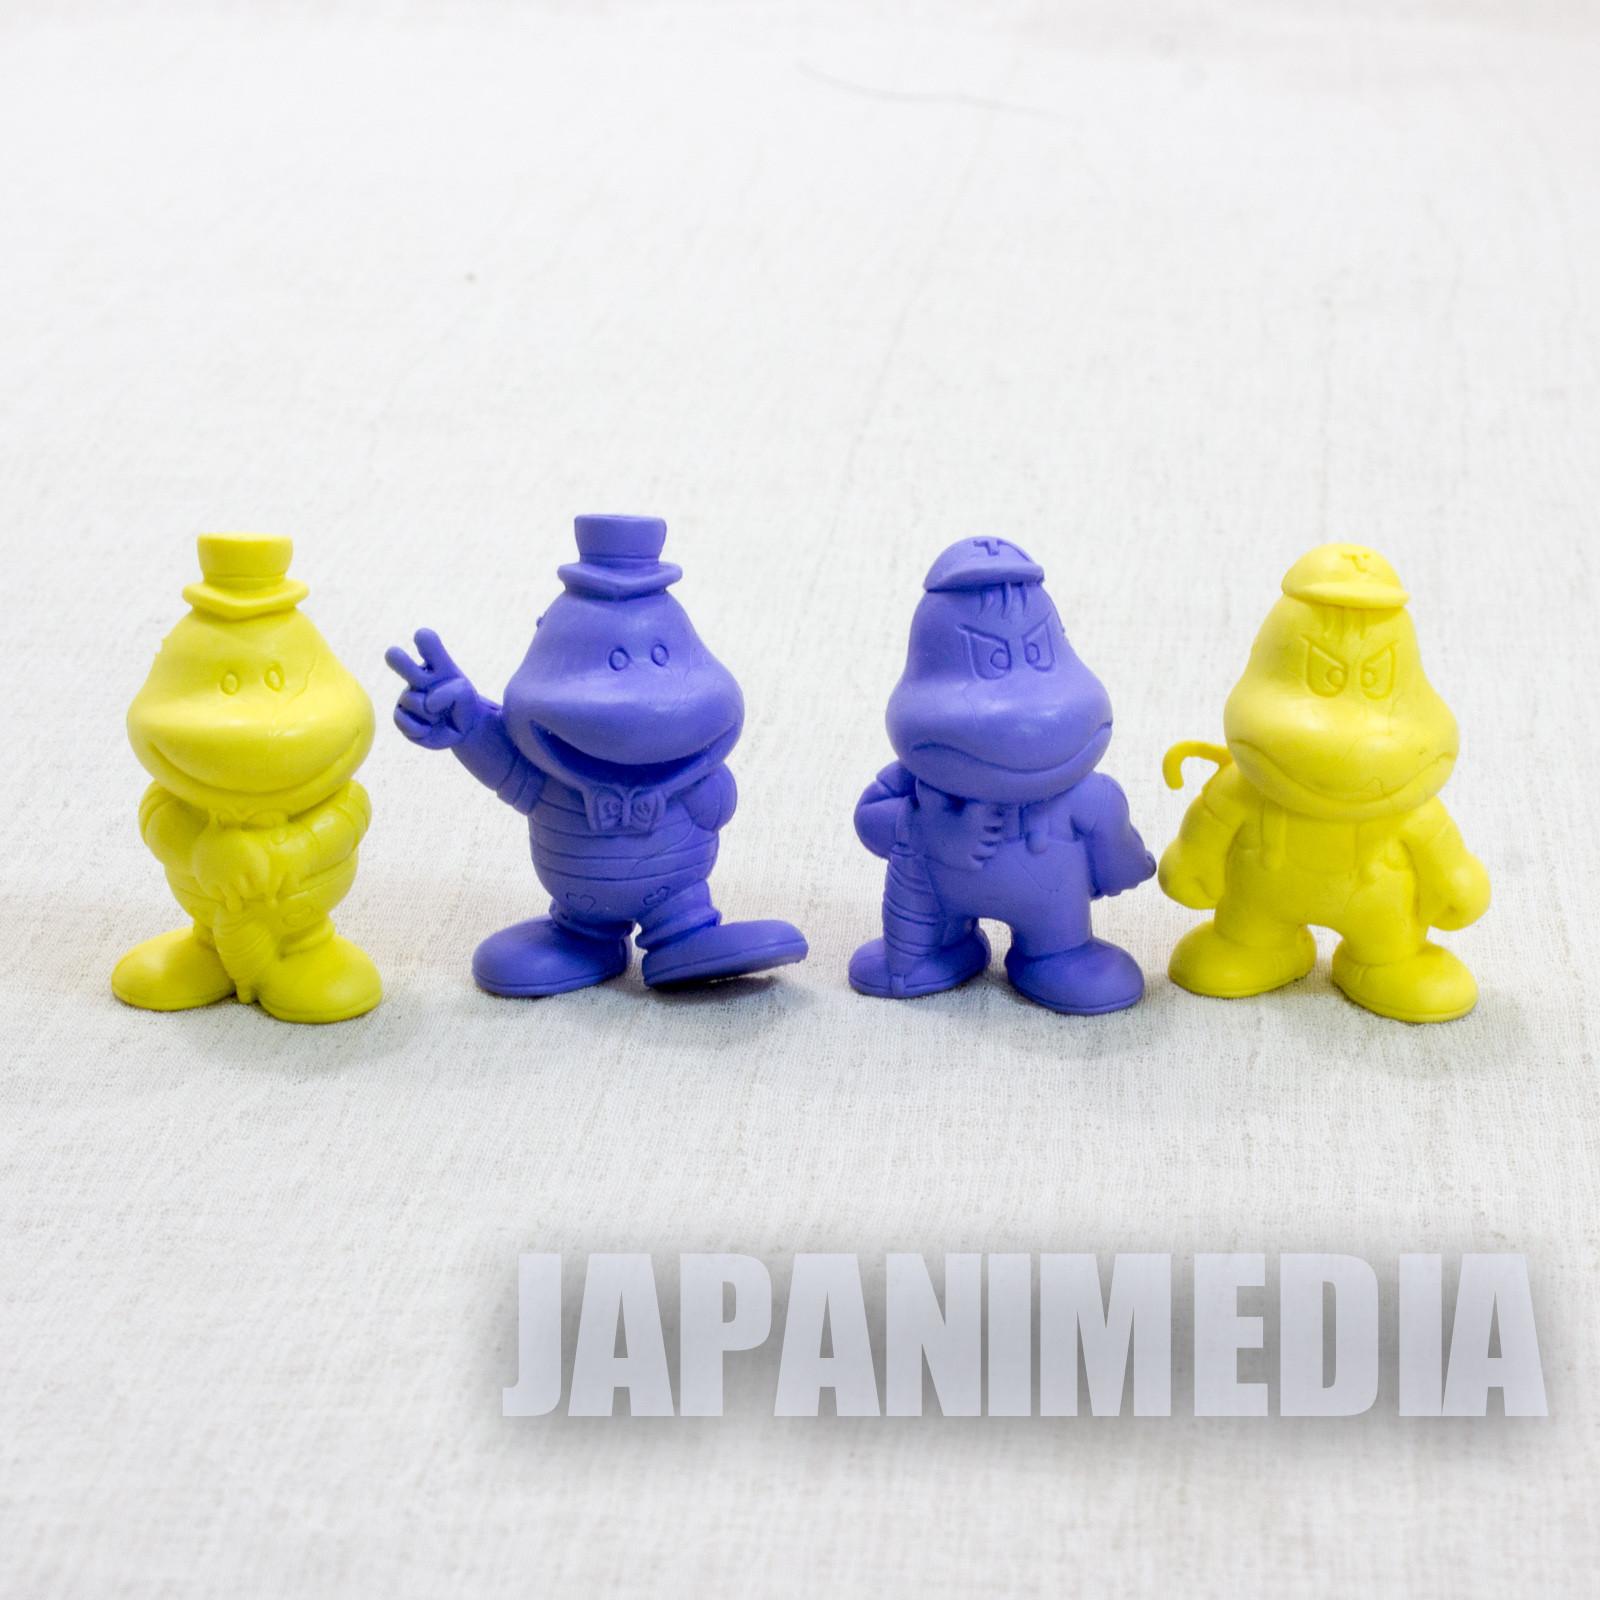 Retro RARE! Parasol Henbee Mini Rubber Figure 4pc set Fujiko A. Fujio JAPAN